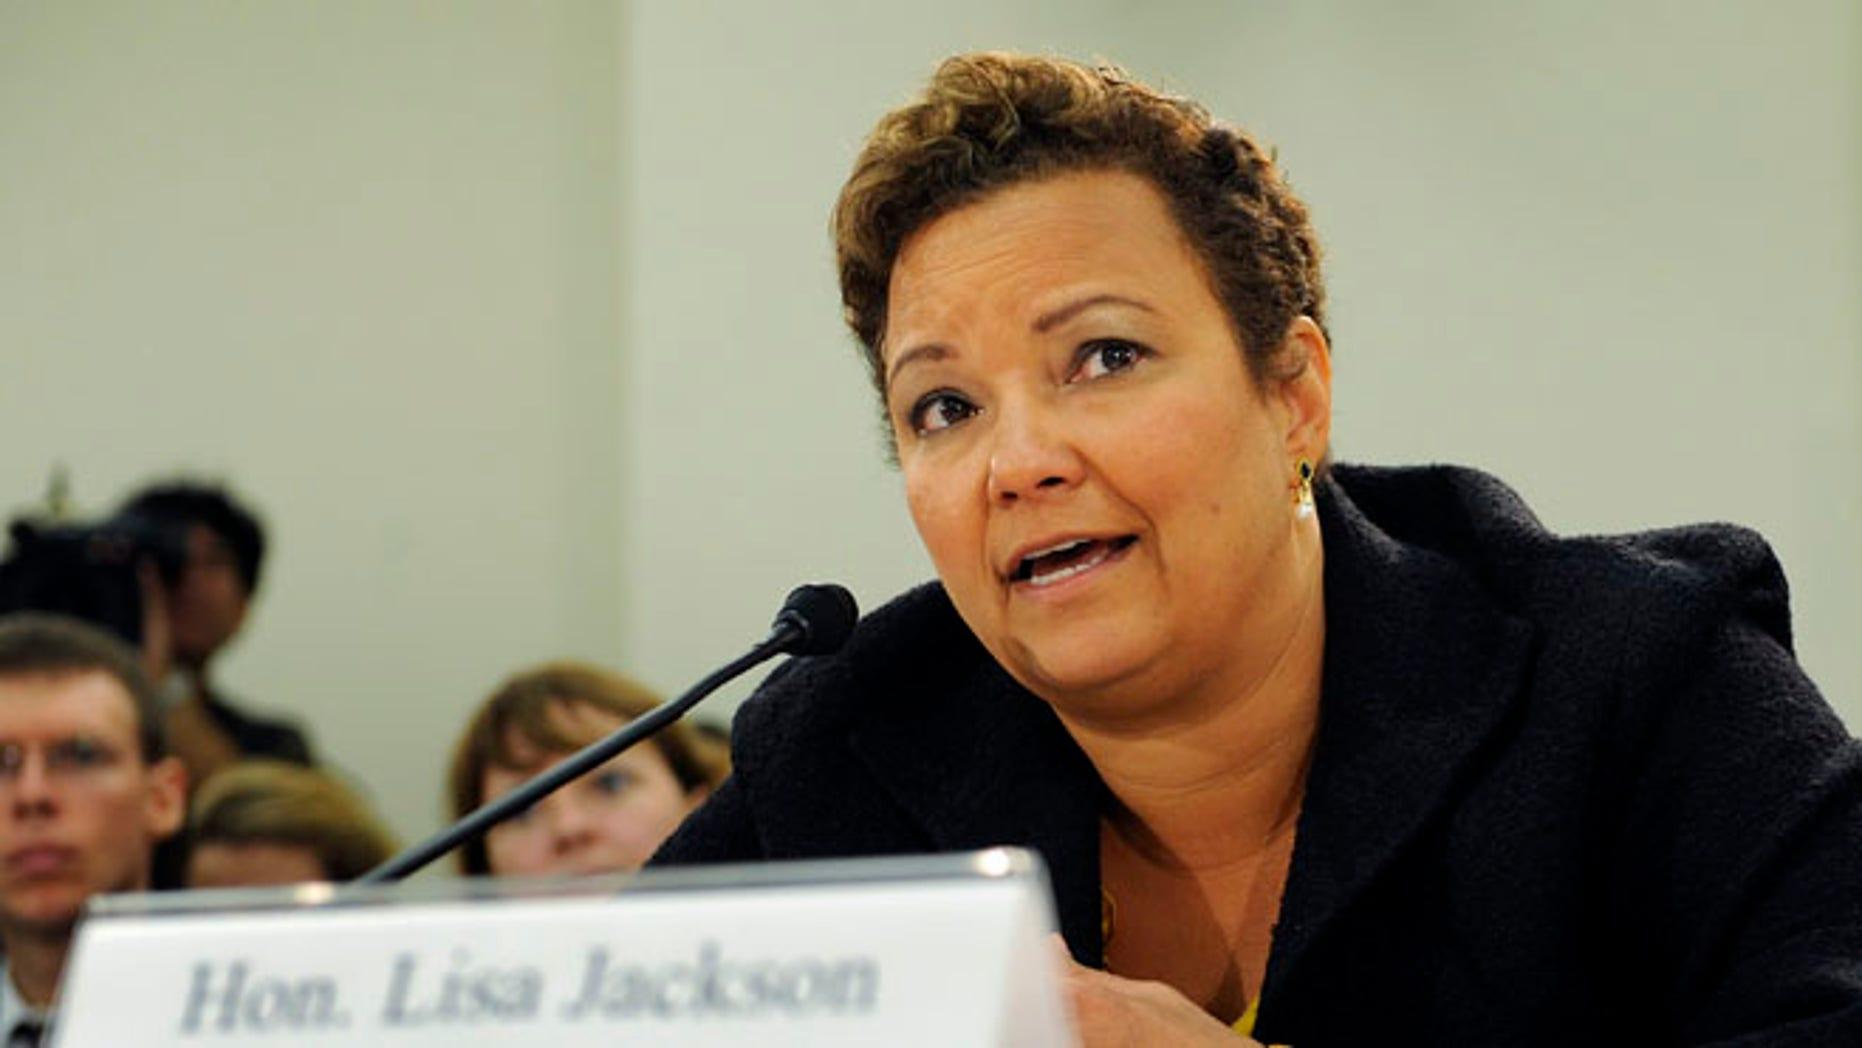 FILE: September 22, 2011: Environmental Protection Agency Administrator Lisa Jackson testifies at a Capitol Hill hearing in Washington.